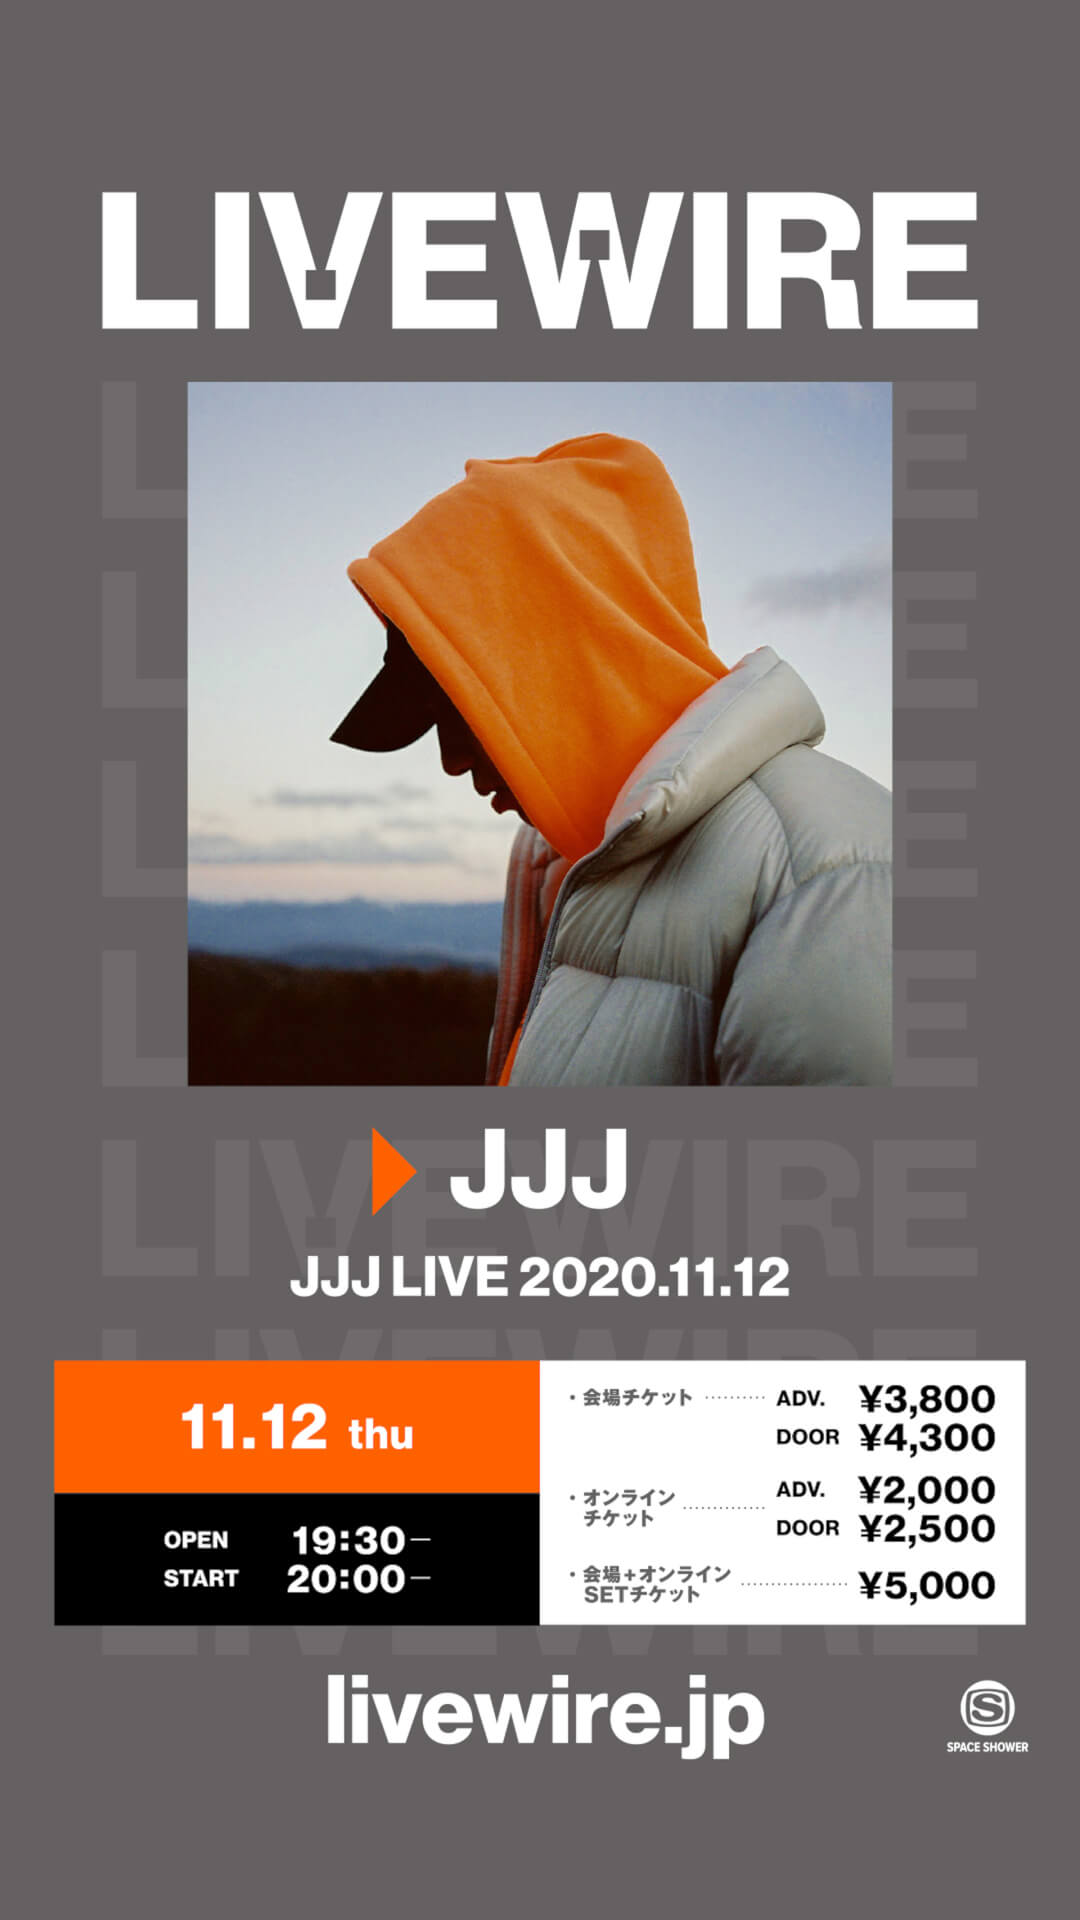 JJJによる3年ぶりのワンマンライブが恵比寿LIQUIDROOMで開催決定!LIVEWIREにて生配信も music201027_jjj_live_1